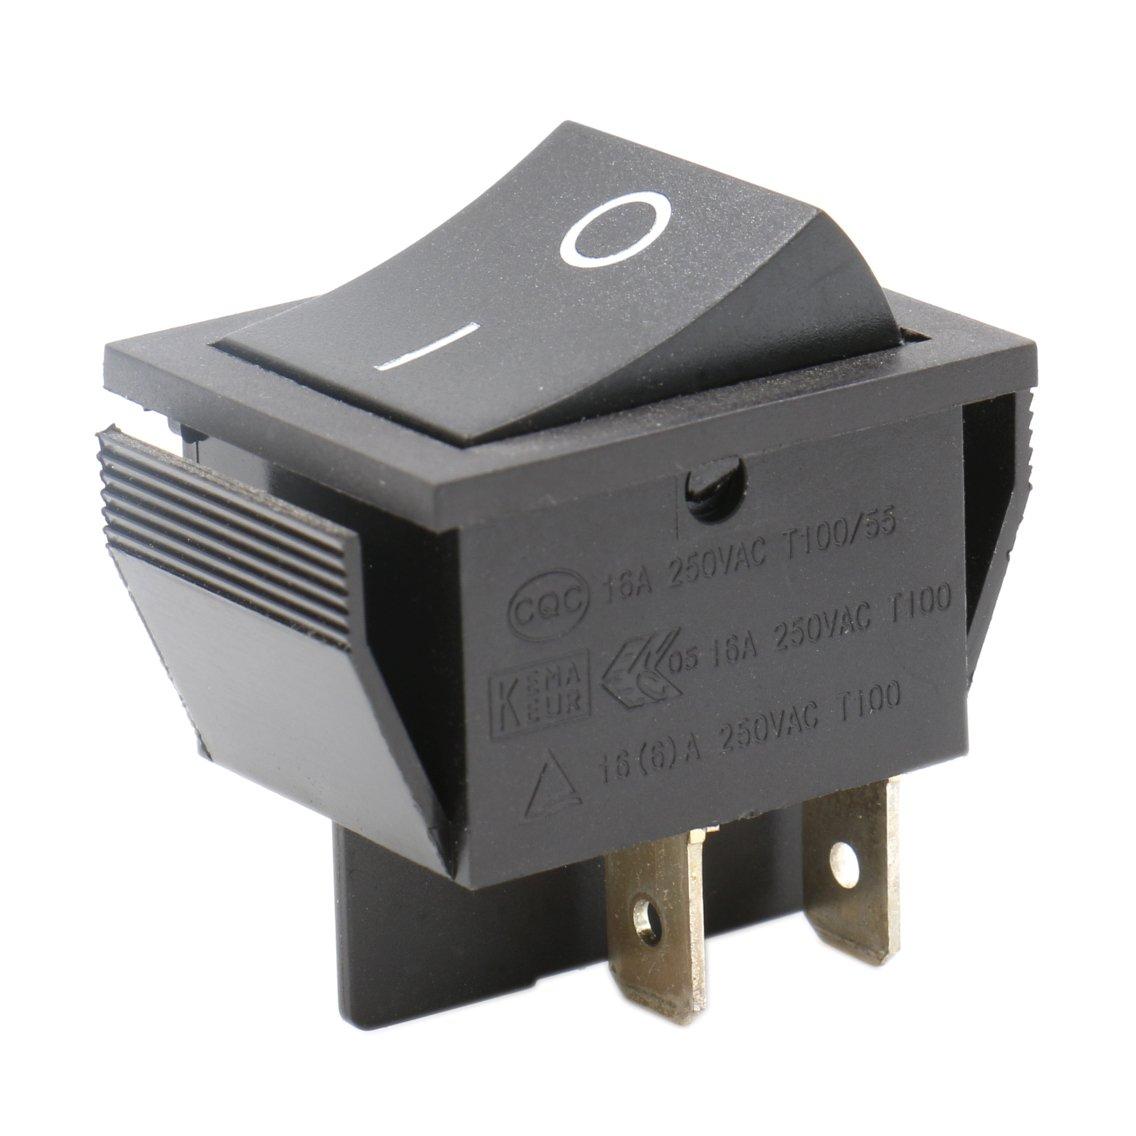 Heschen Interrupteur à bascule ON/OFF Dpst On-Off 4bornes 16A 250VAC Noir Lot de 2 Ningbo Master Soken Electrical Co.Ltd RK1-01-HS